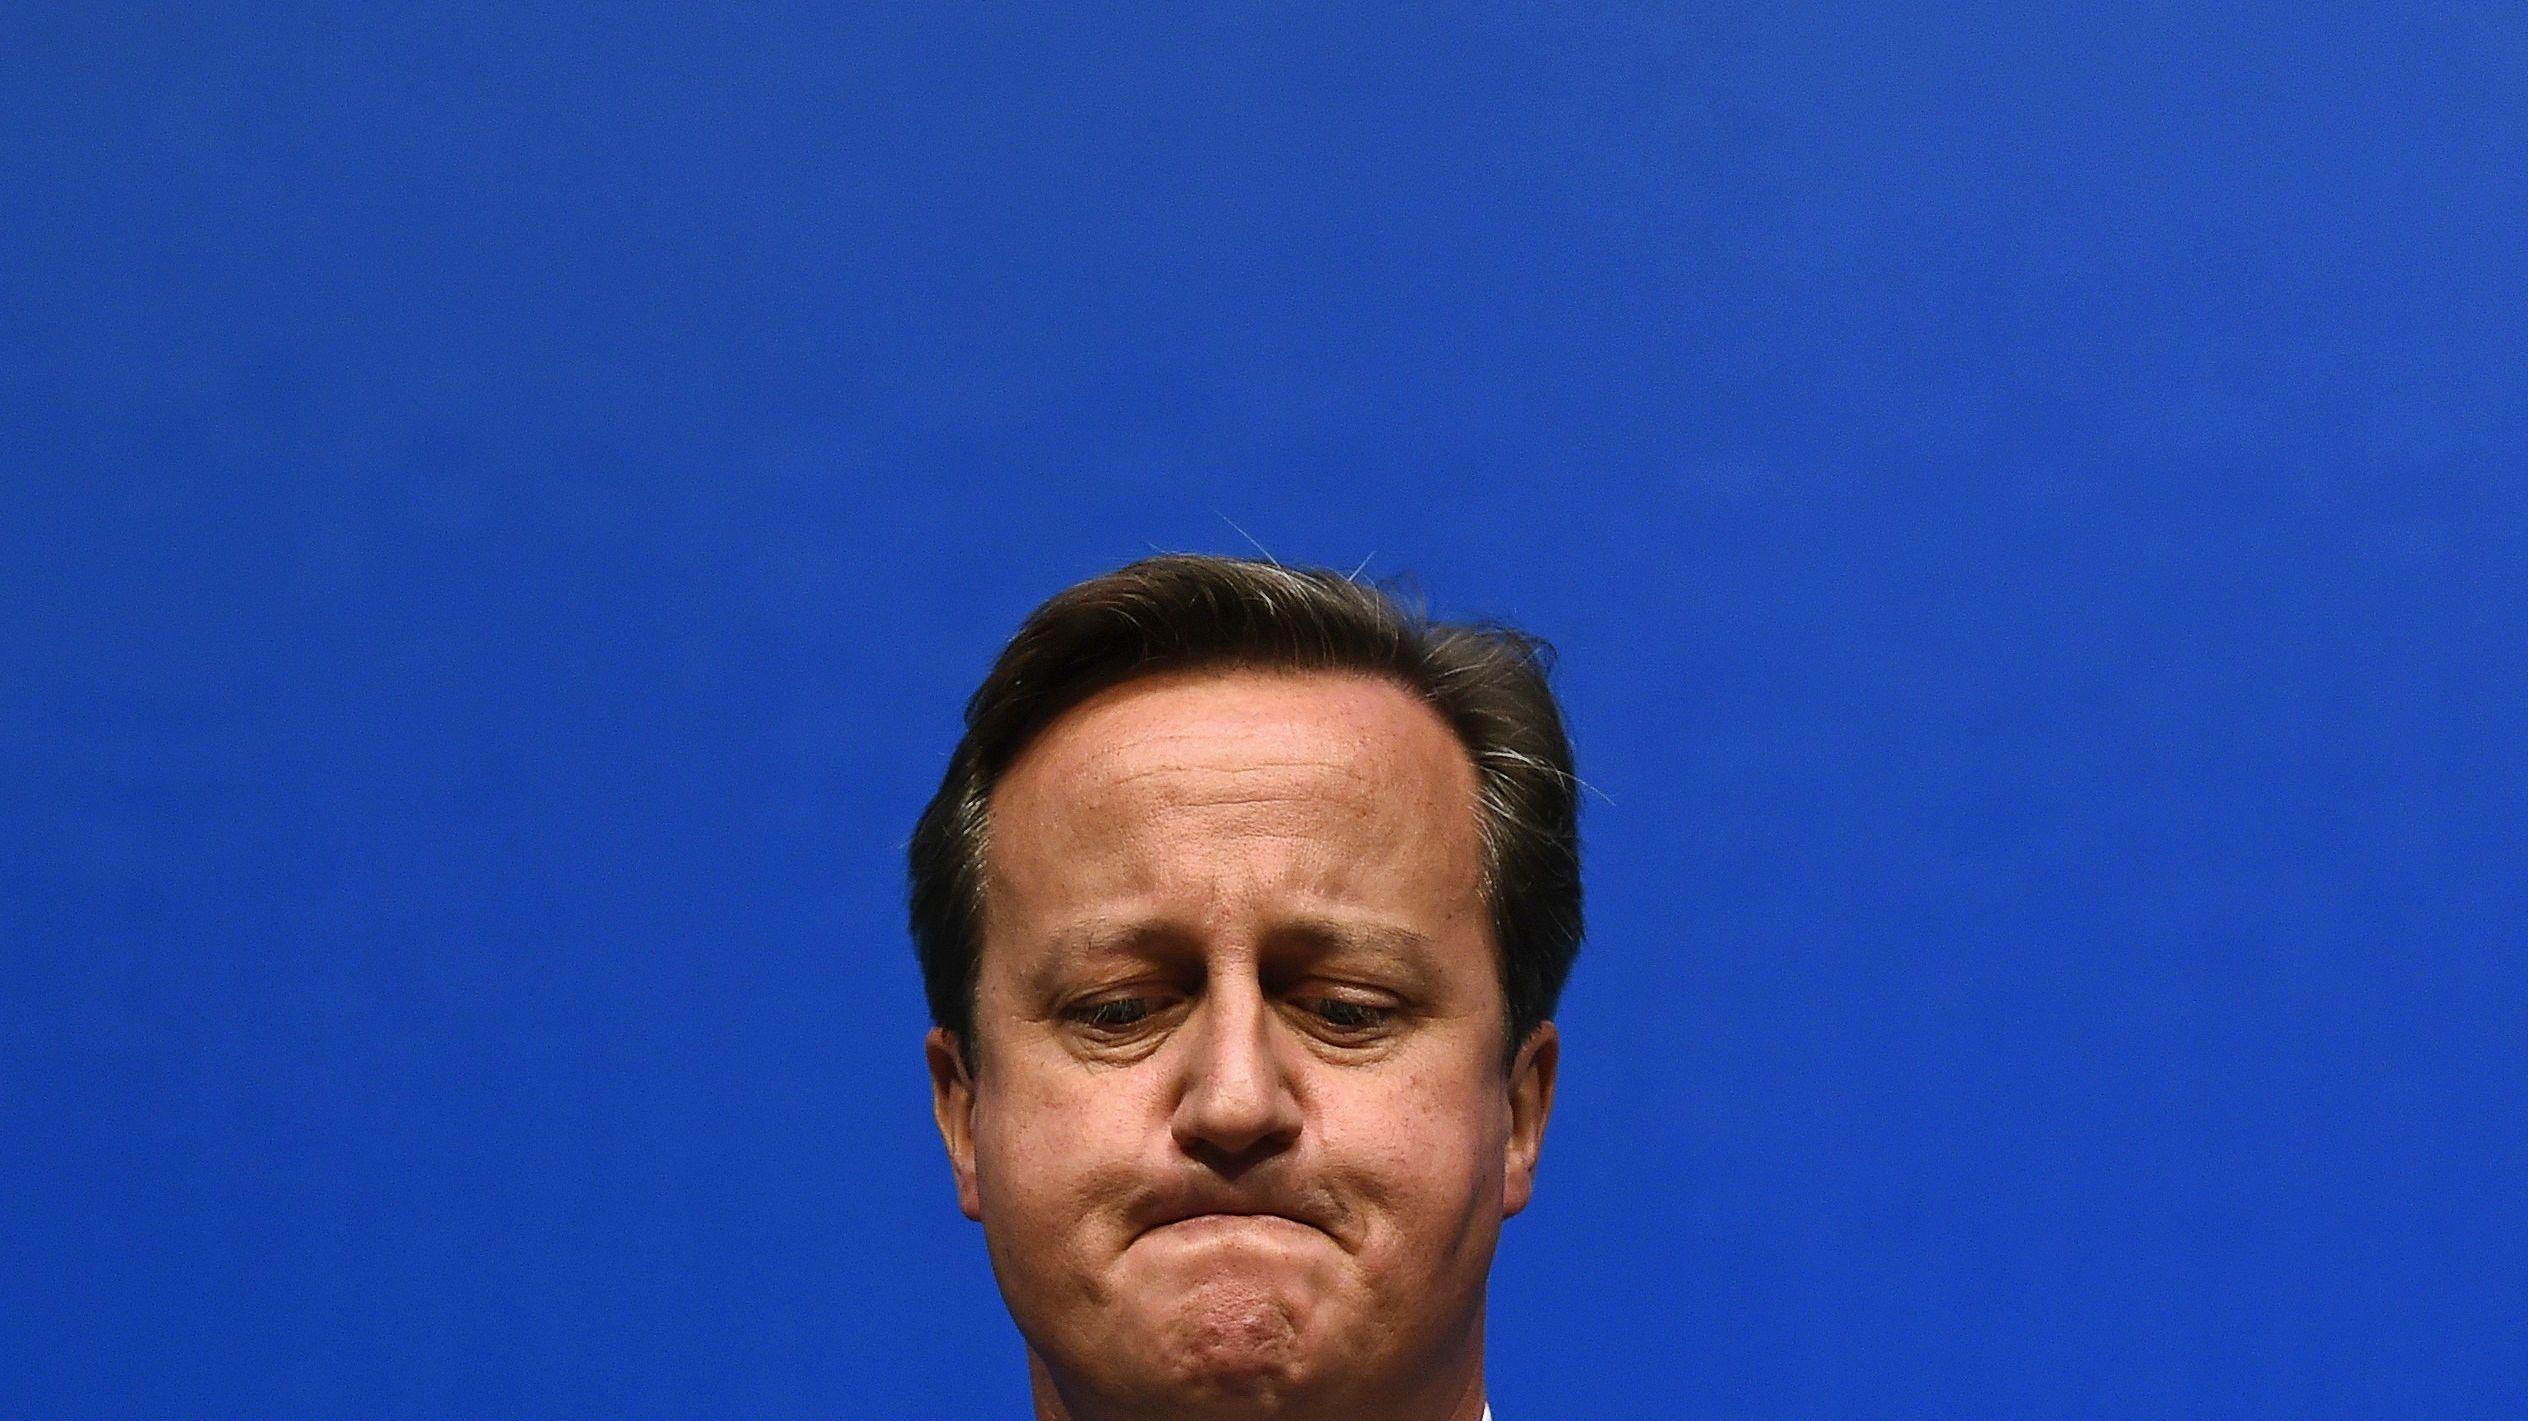 David Cameron John Oliver pig